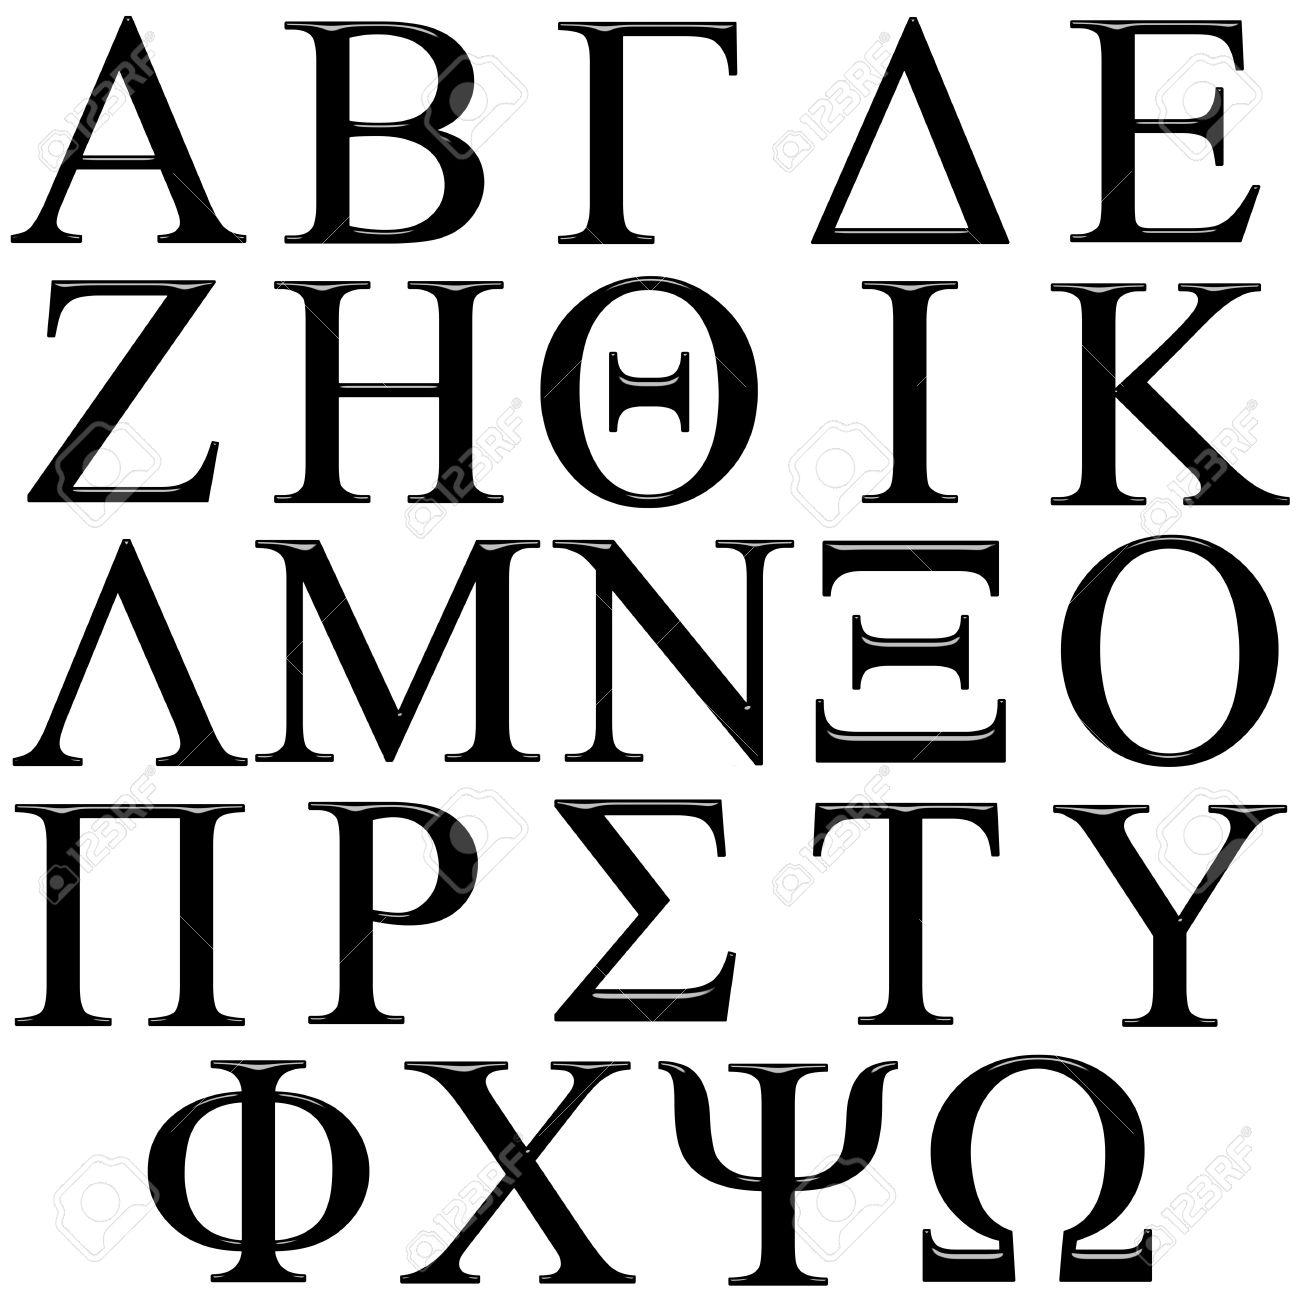 Clipart greek letters.